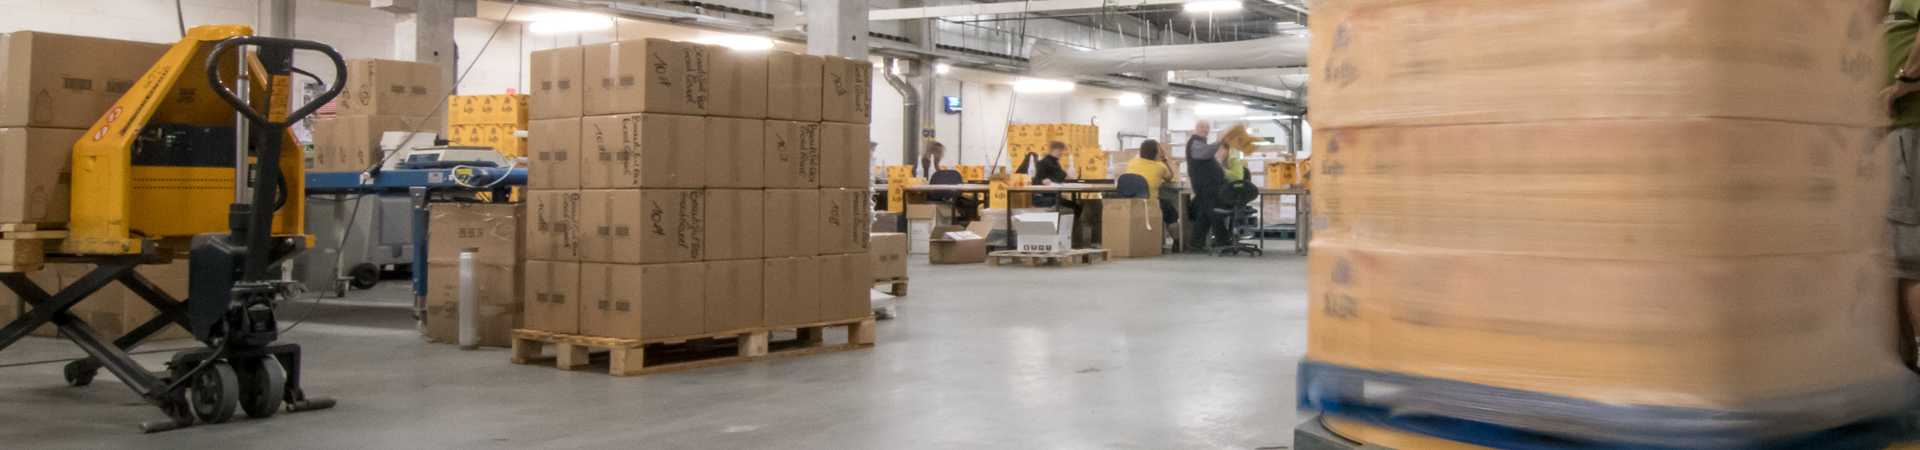 Co-packing bij maatwerkbedrijf AMAB